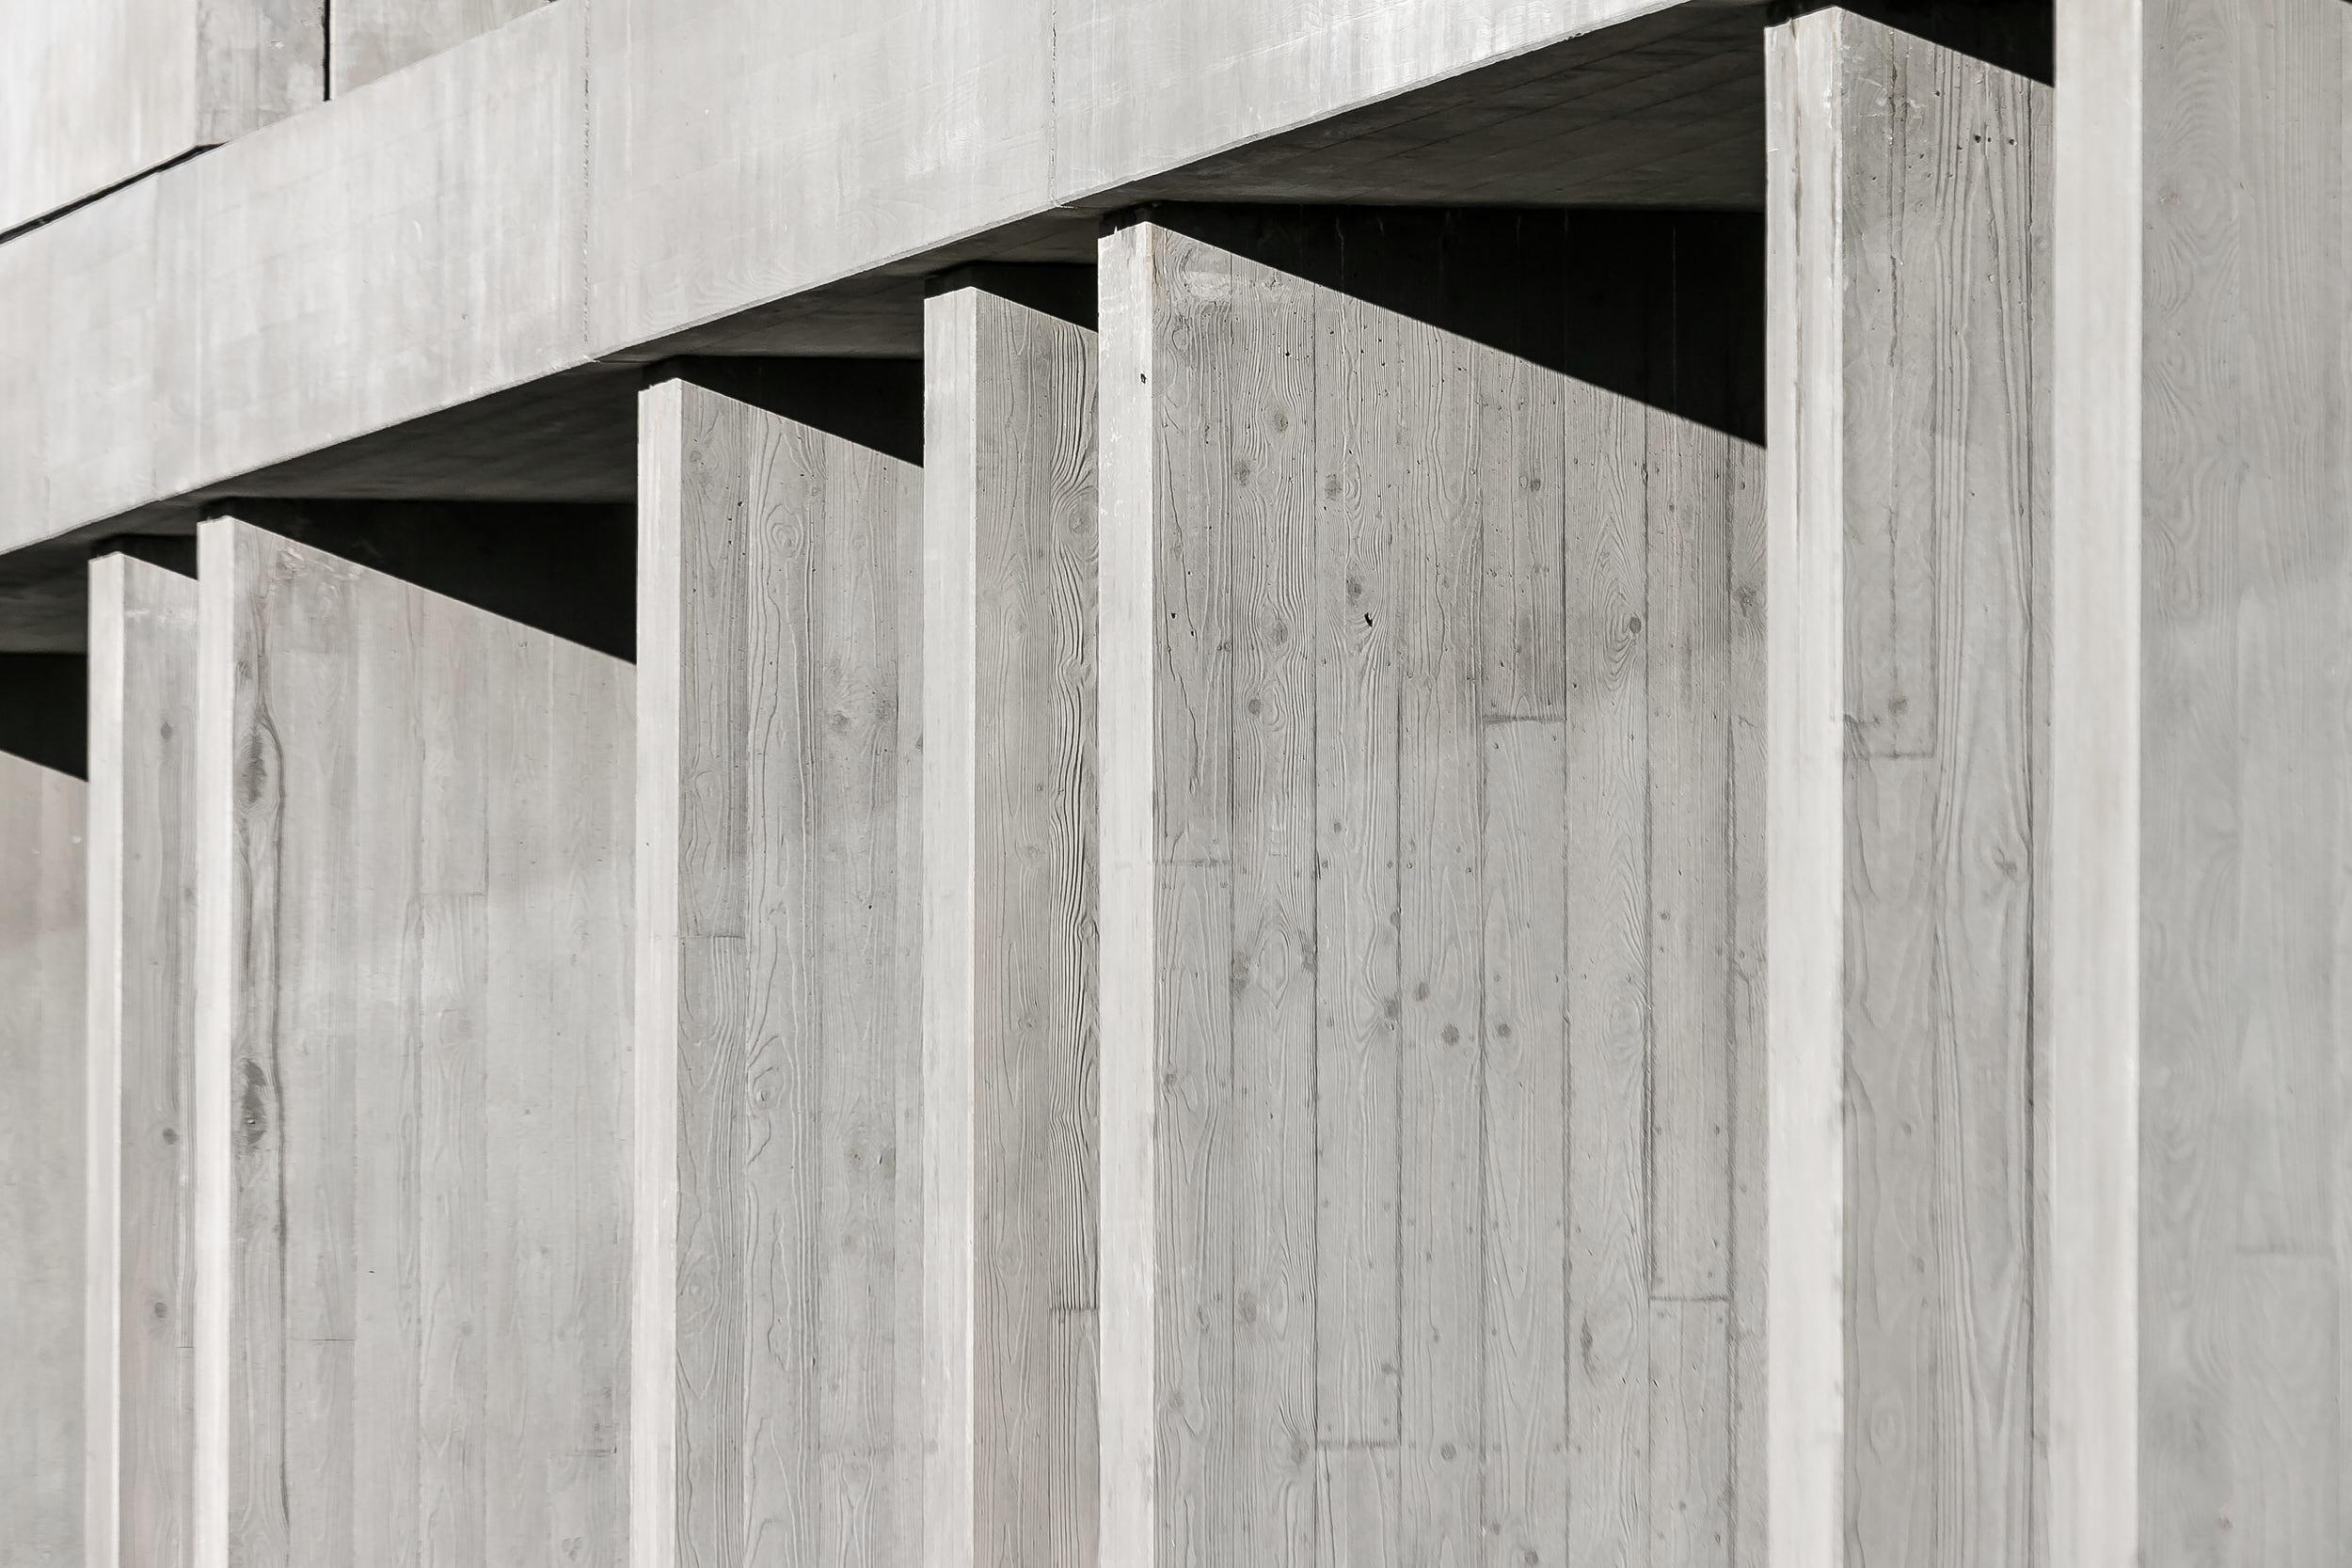 Tribu Offices   by Nicolas Schuybroek — Photo by   Thomas de Bruyne